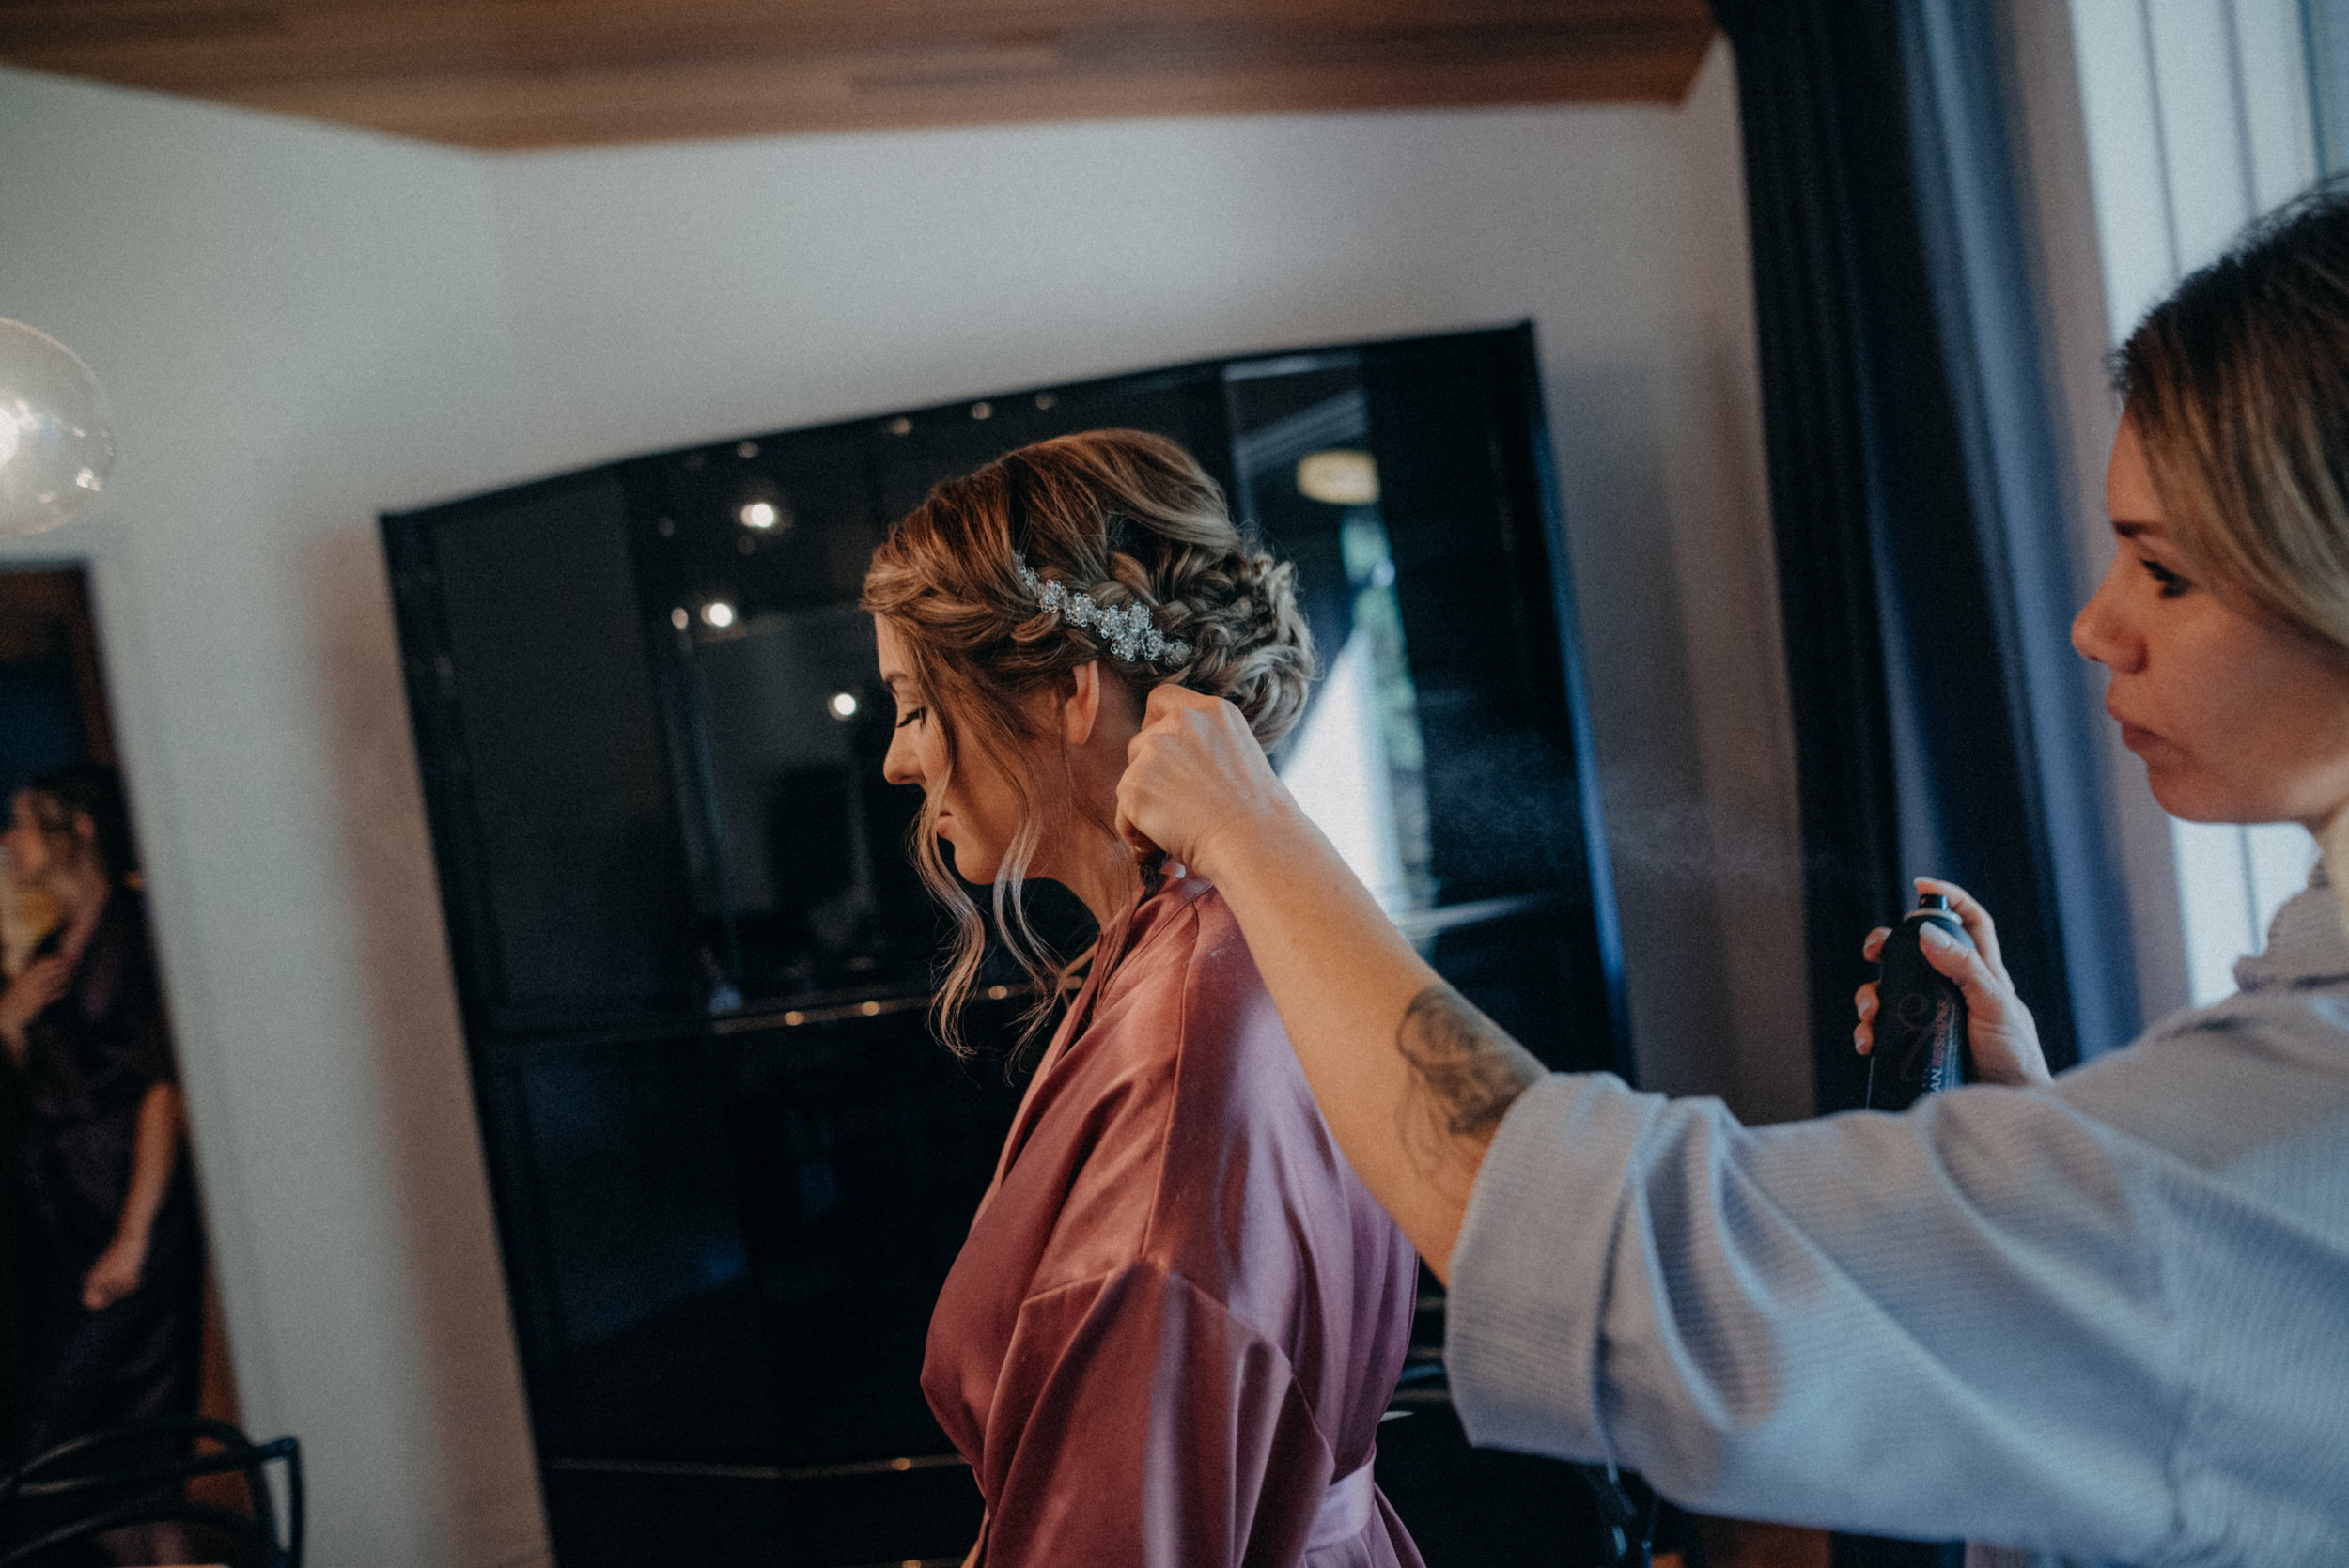 photographe_gatineau_mariage_ottawa_photographer_wedding_natasha_liard_photo_documentary_candid_lifestyle_wakefield_mill_red_bridge (4).jpg